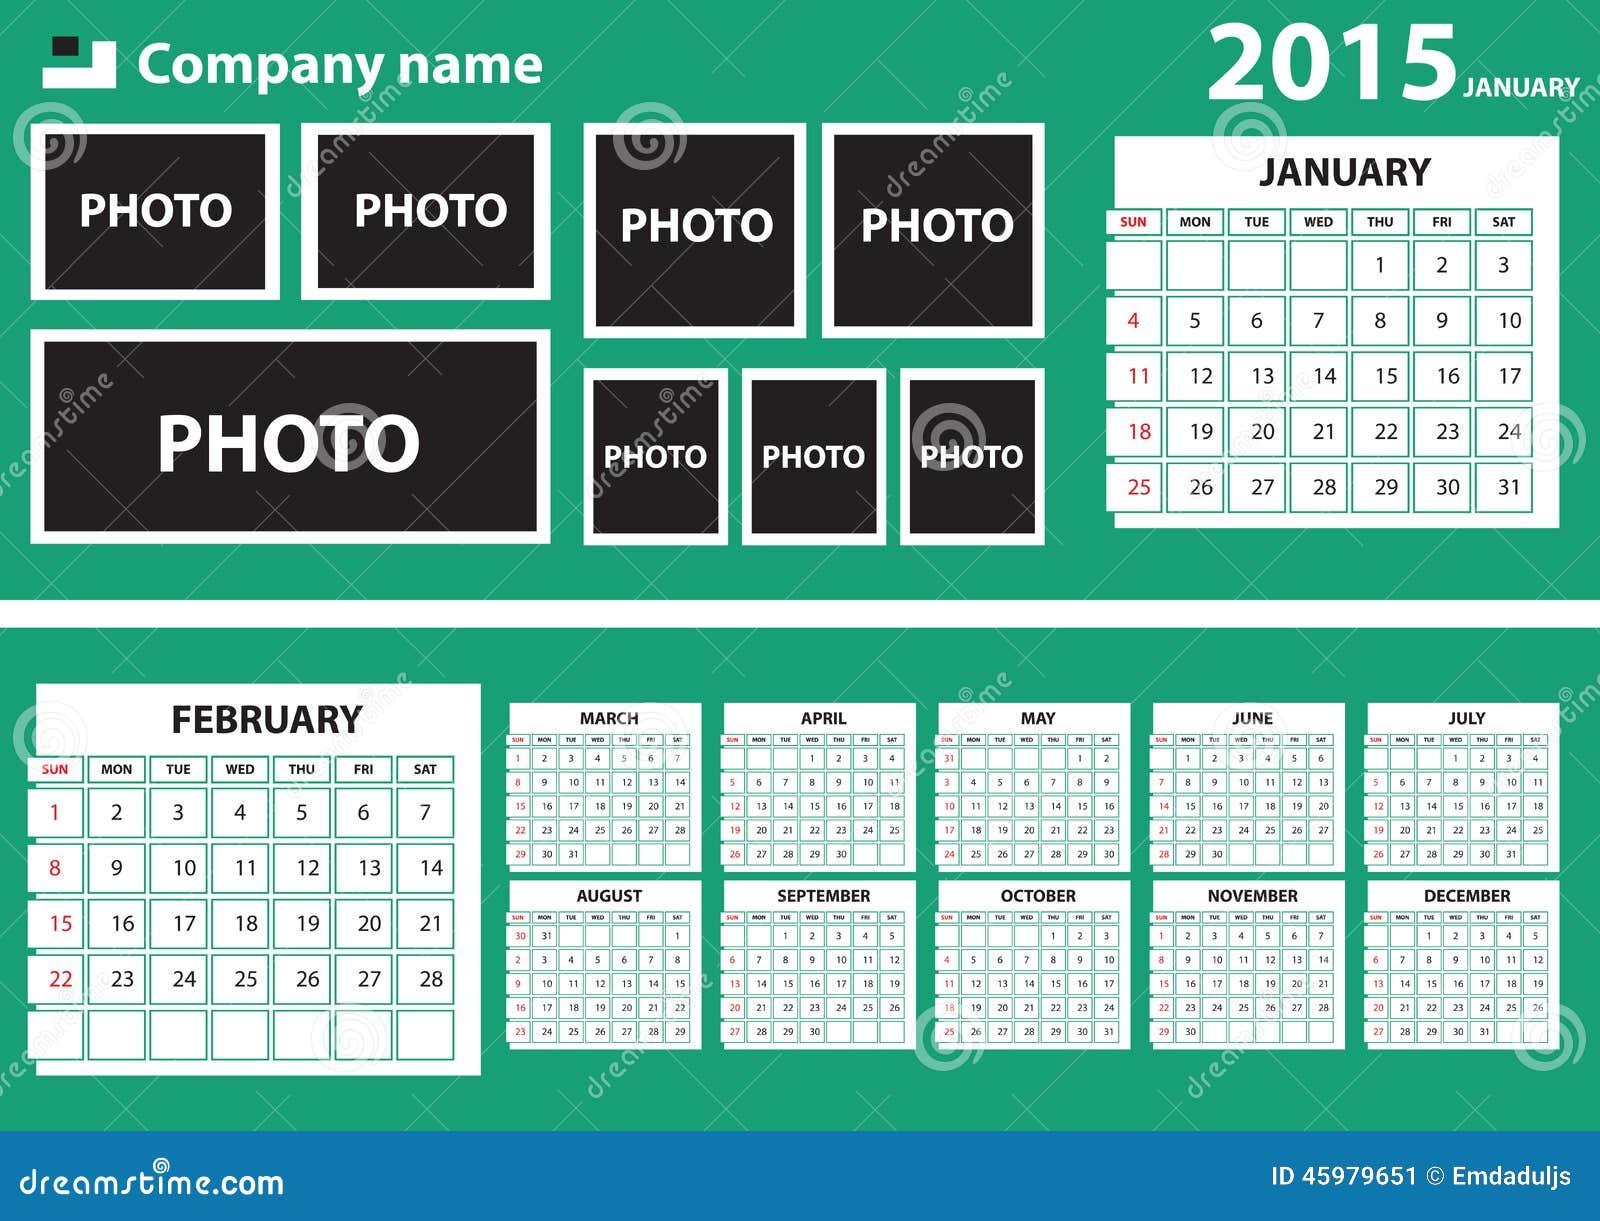 Animated 2015 Calendar New Calendar Template Site